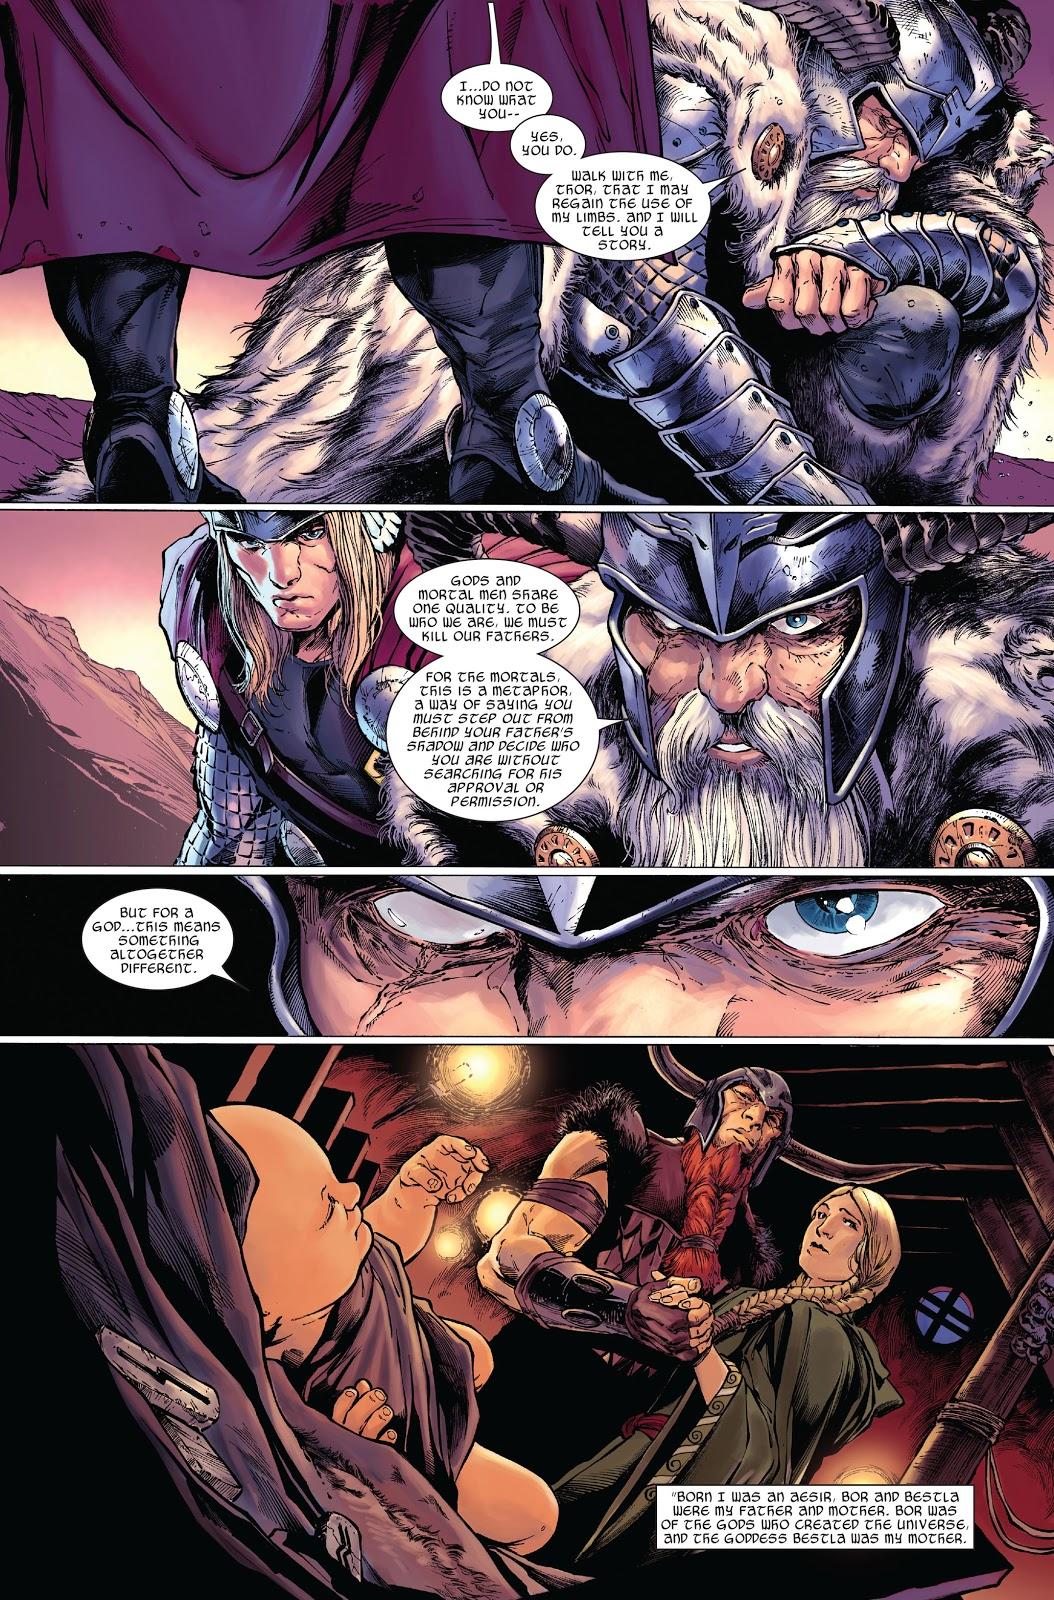 Odin's Origin Story